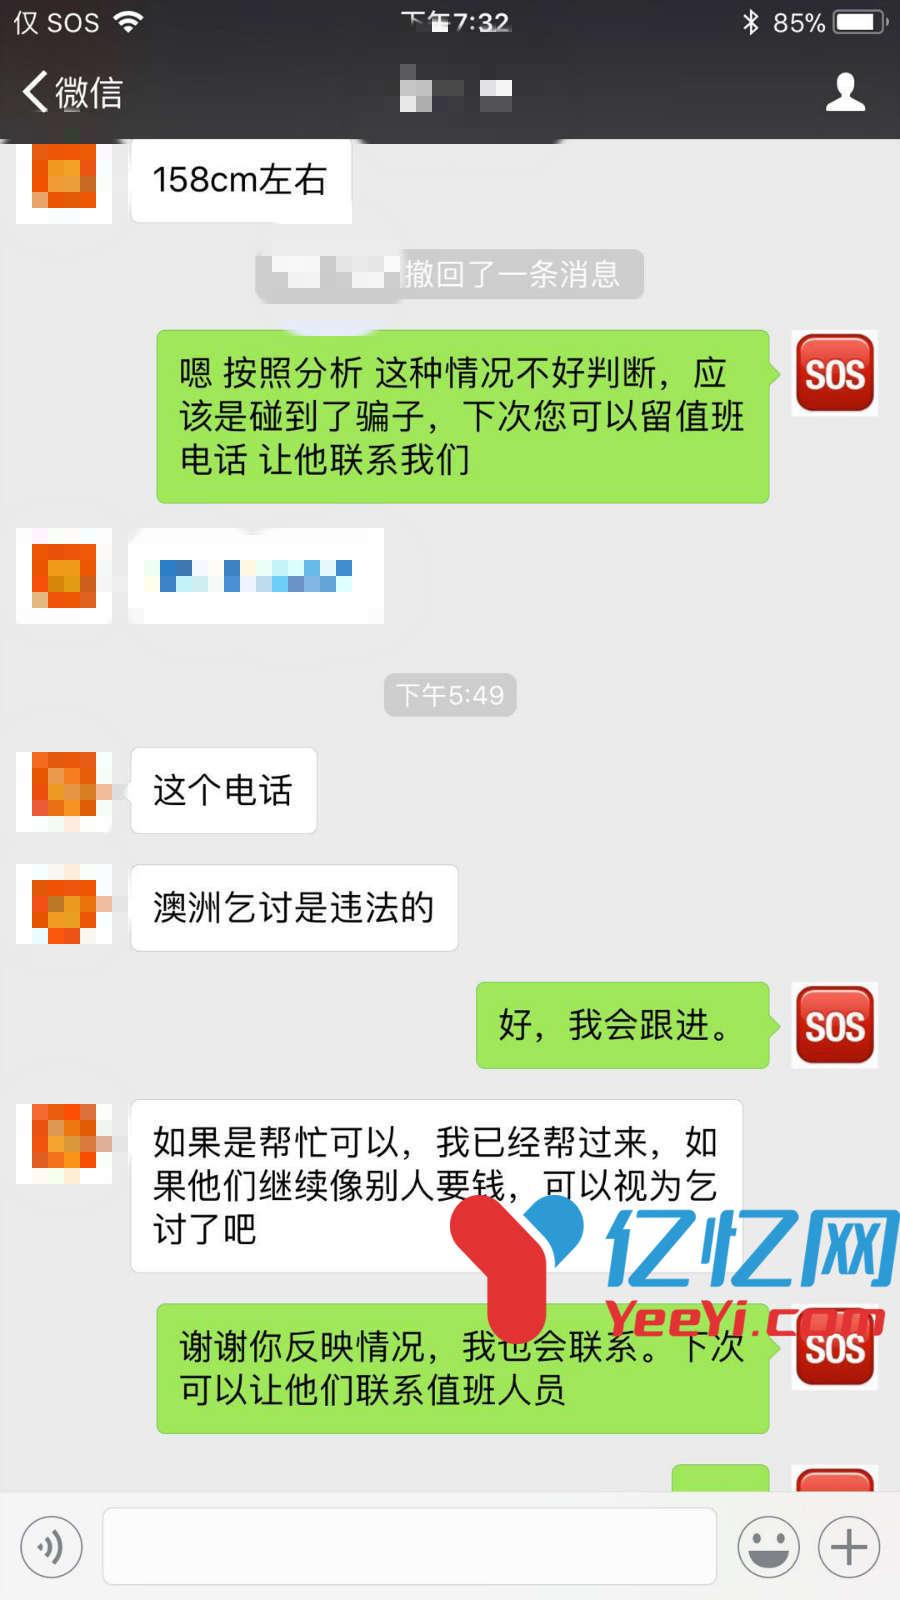 WeChat Image_20180705081724_meitu_4.jpg